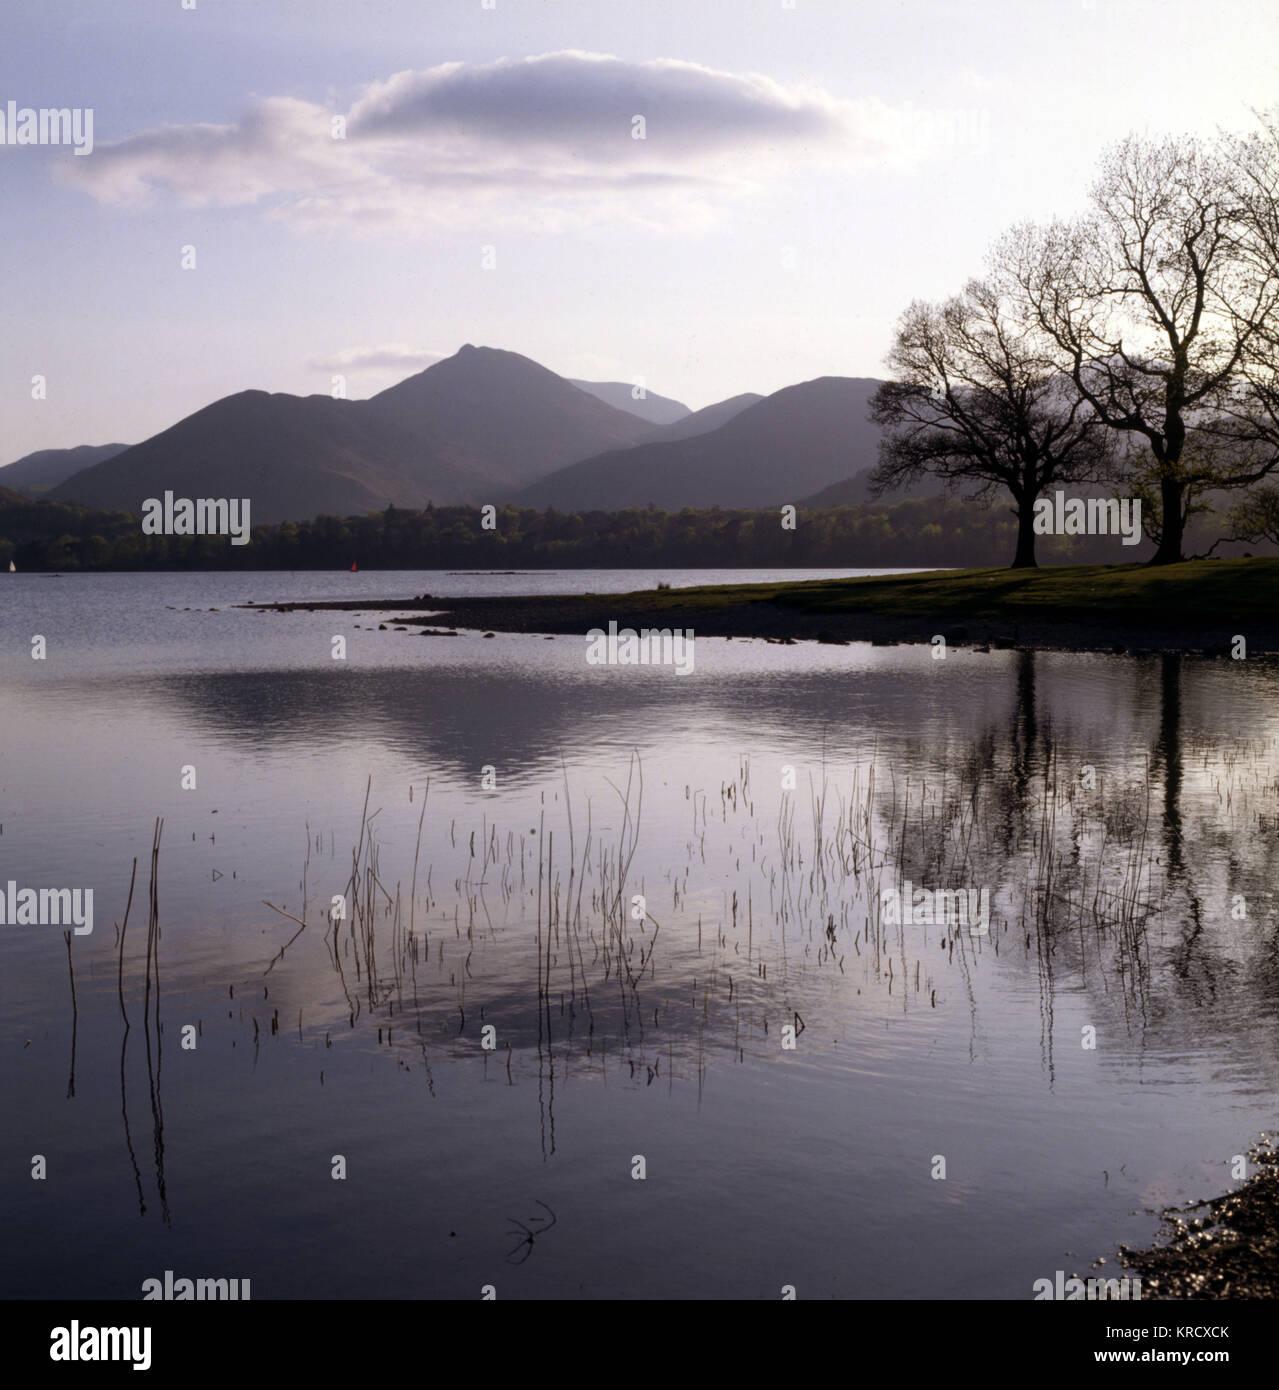 Un soir voir de Derwentwater, Lake District, Cumbria, cherchent à Causey Pike, de Strandshag Bay. Date: Photo Stock